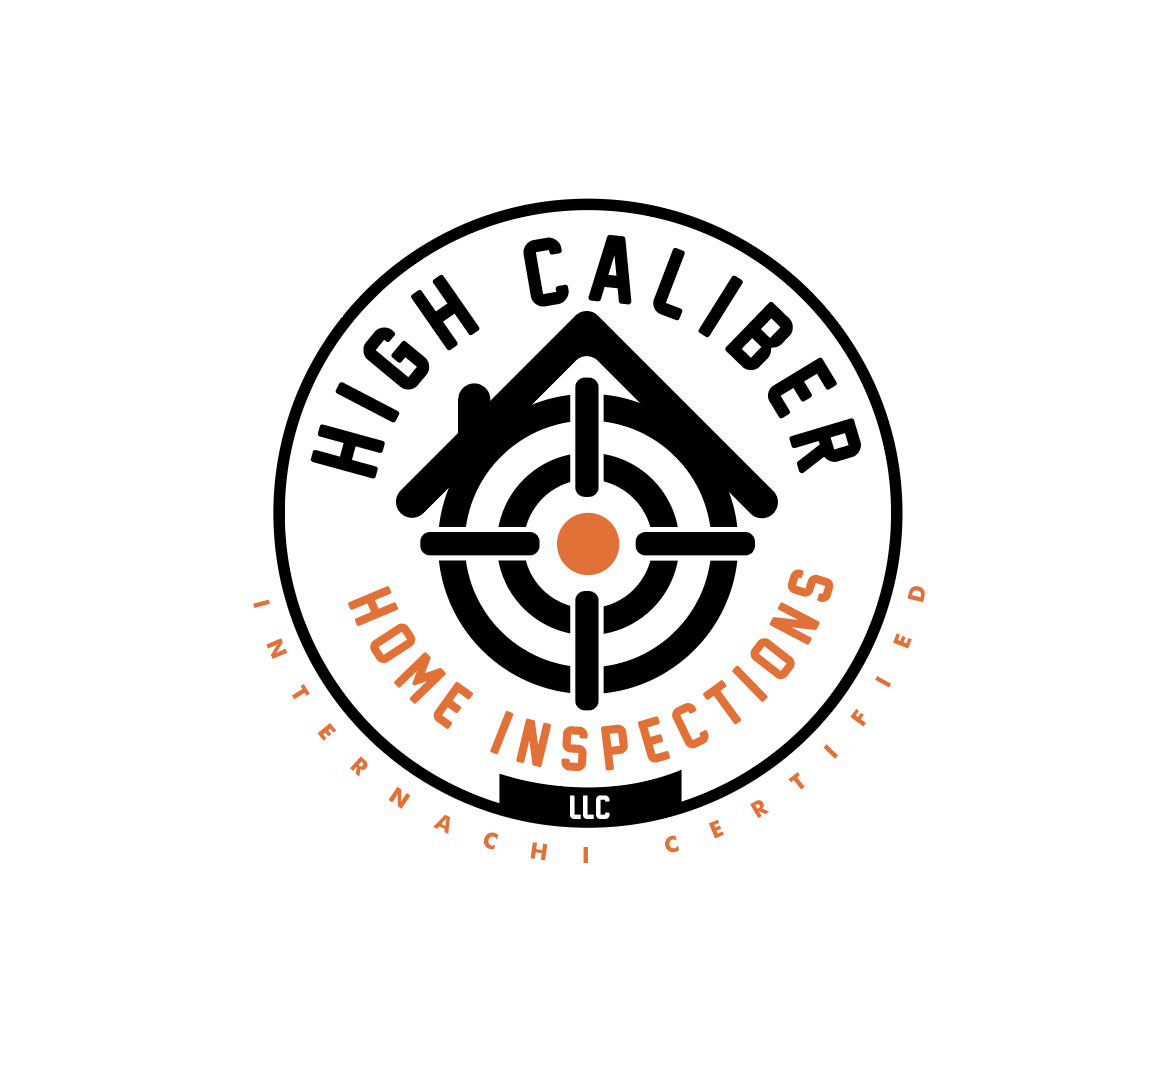 High cal logo